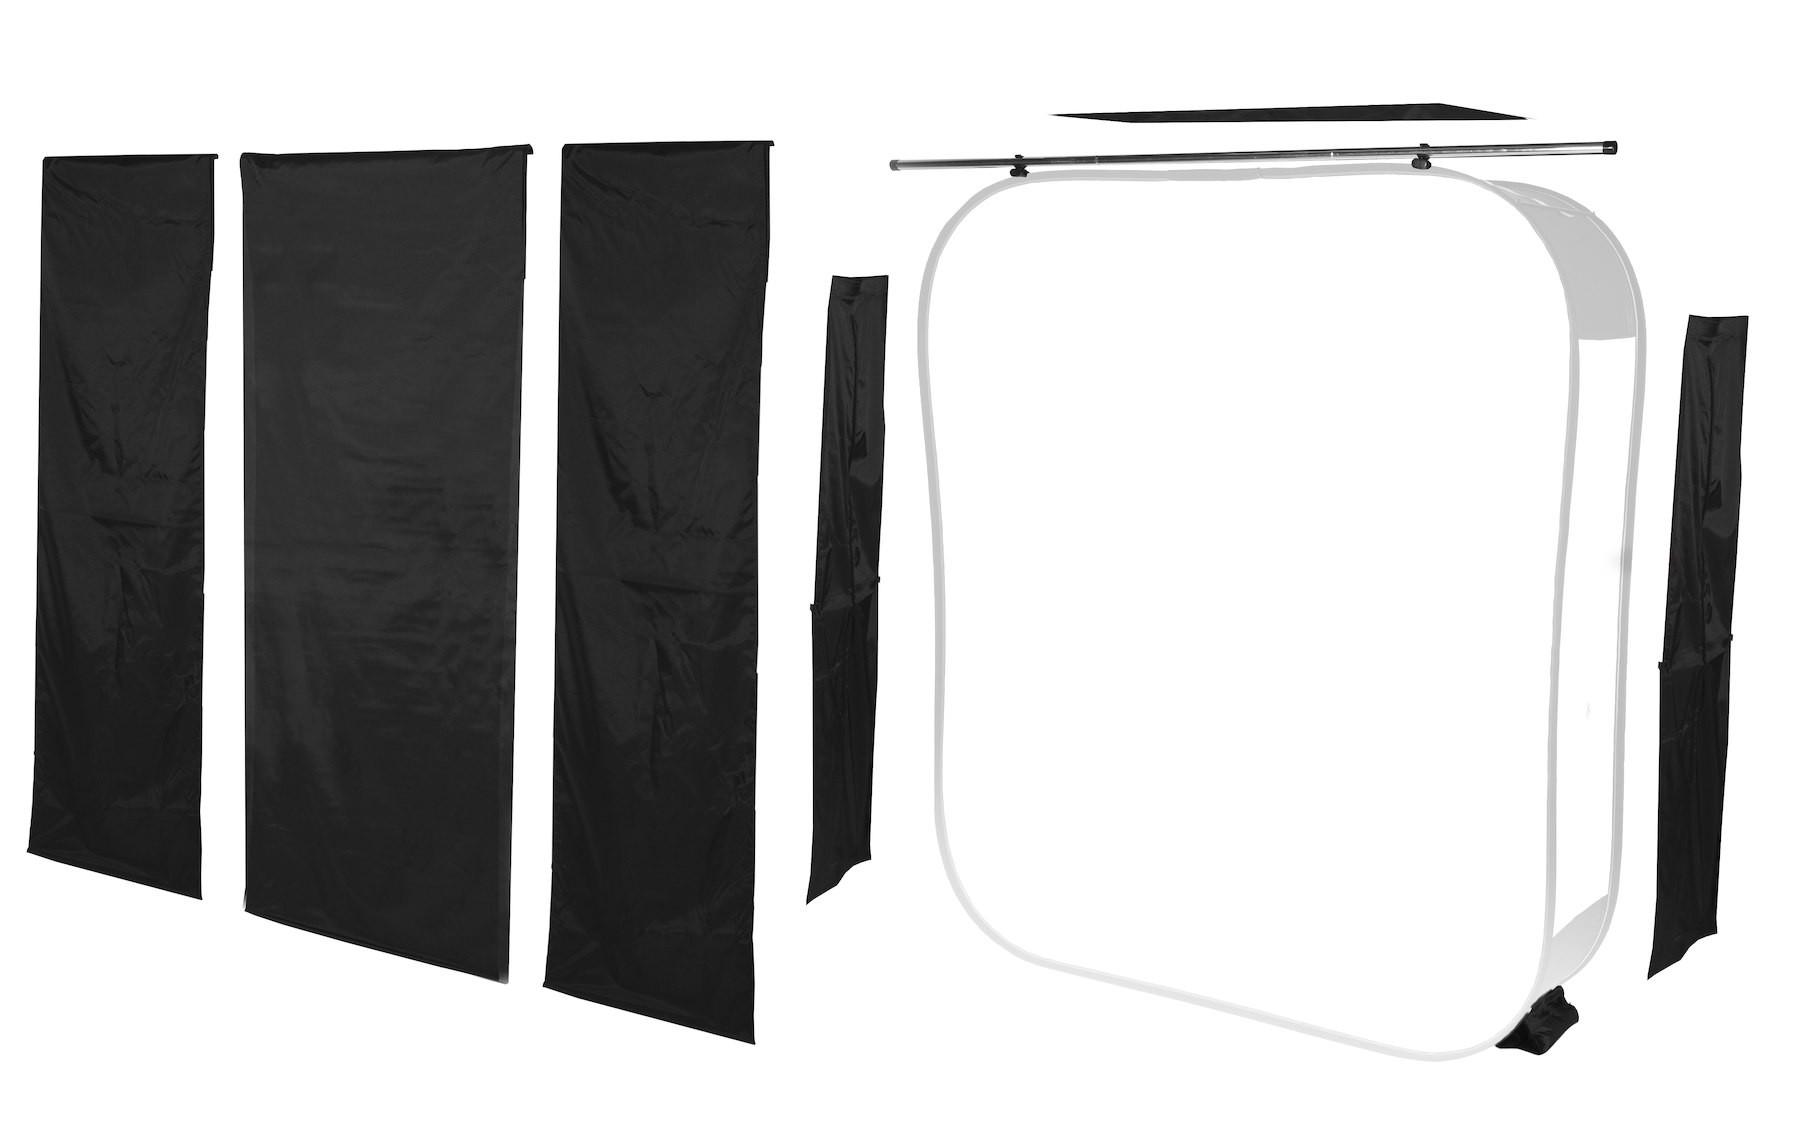 Lastolite Shapers & Masks Abschatter-Set für HiLite 1,8 x 2,15m (LL LB8967)